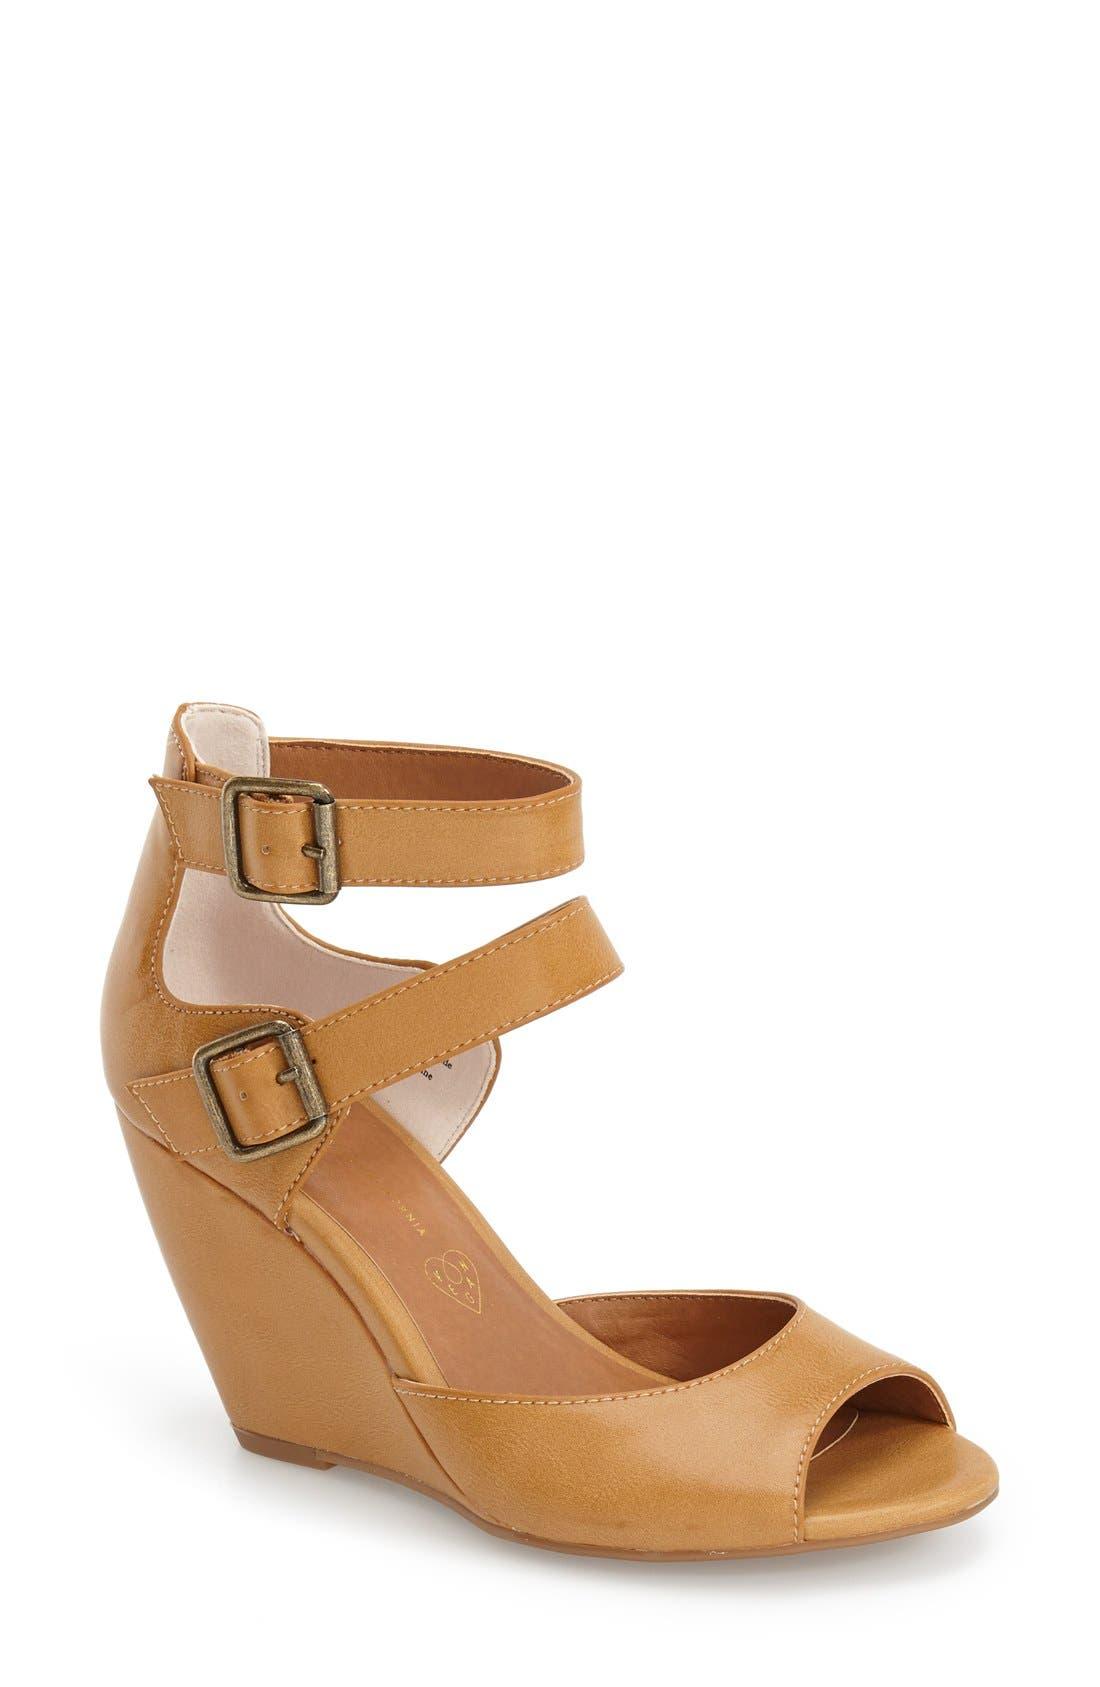 Main Image - BC Footwear 'Spark' Wedge Sandal (Women)